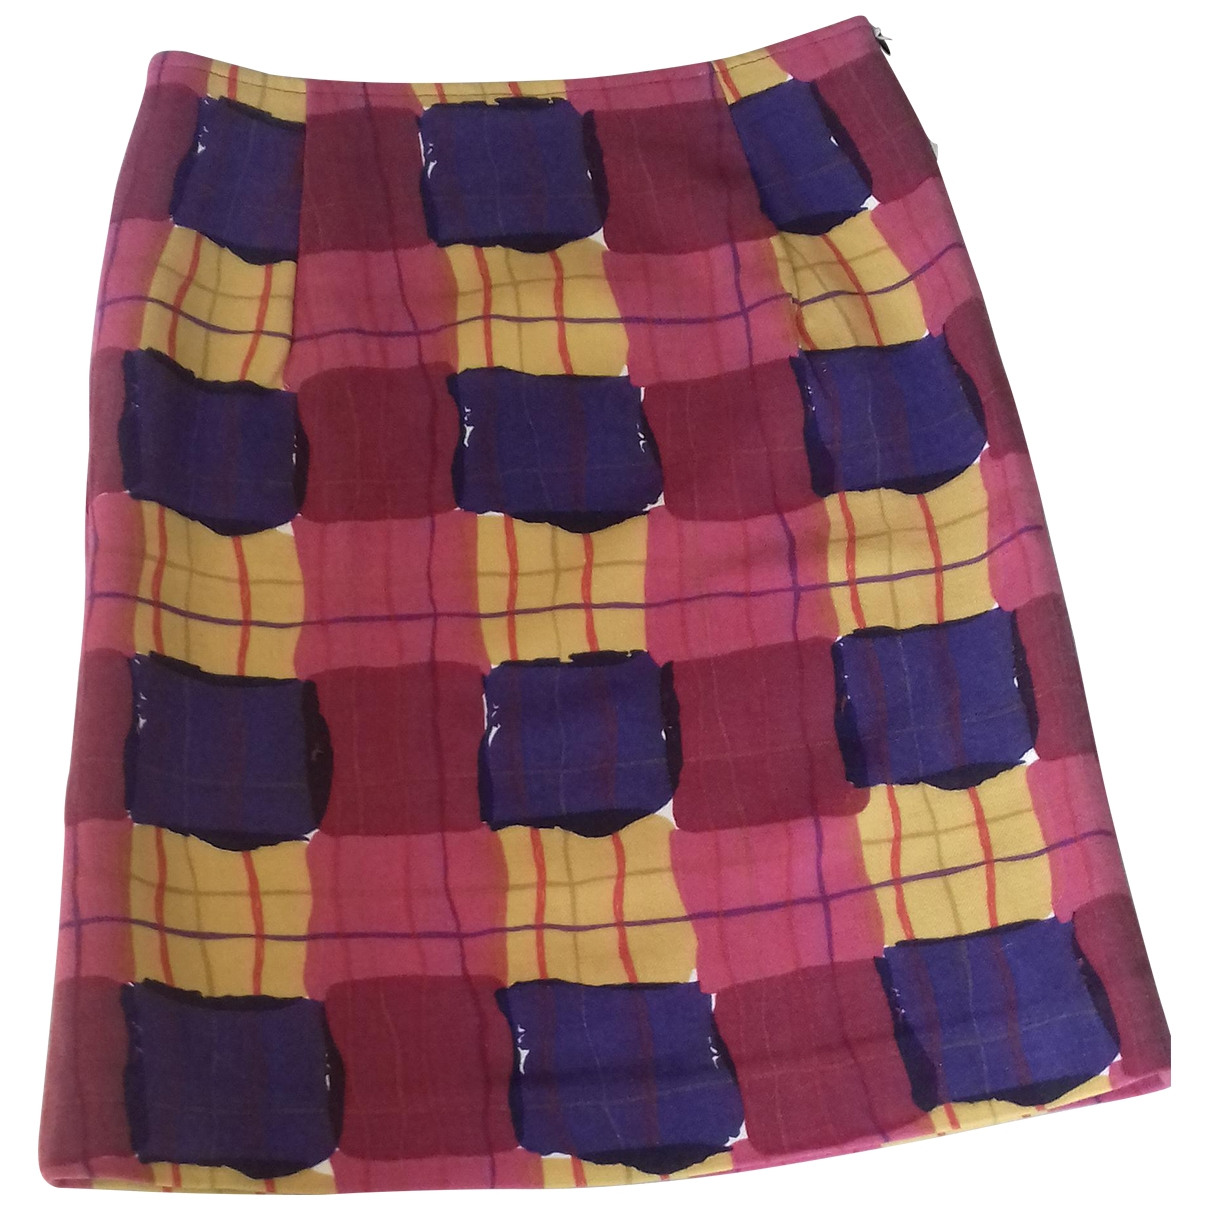 Marni \N Multicolour Wool skirt for Women 44 IT